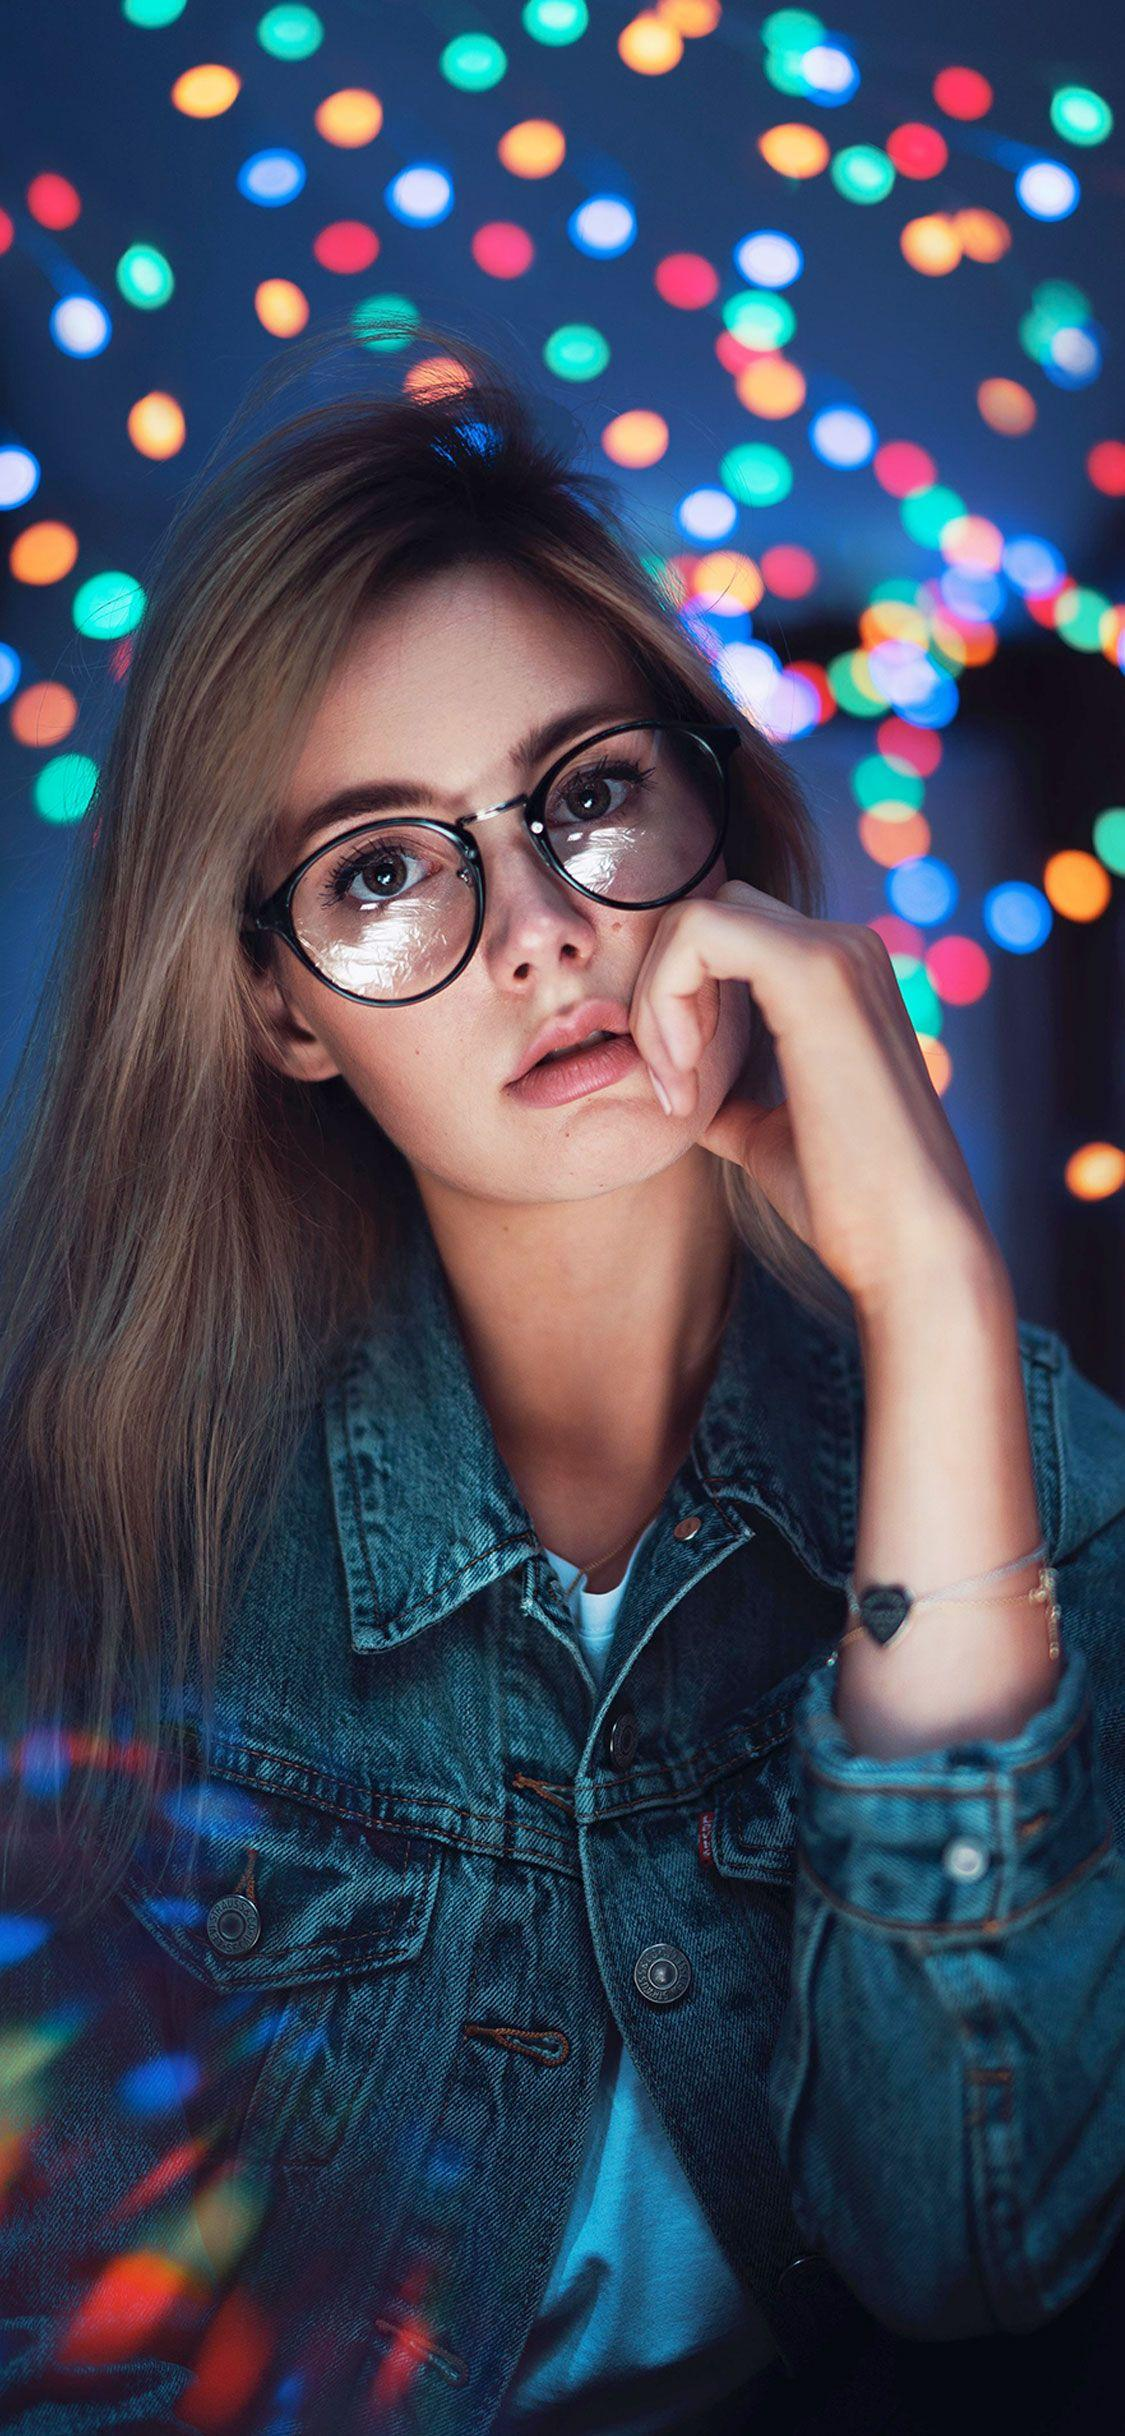 girl wallpaper design ideas